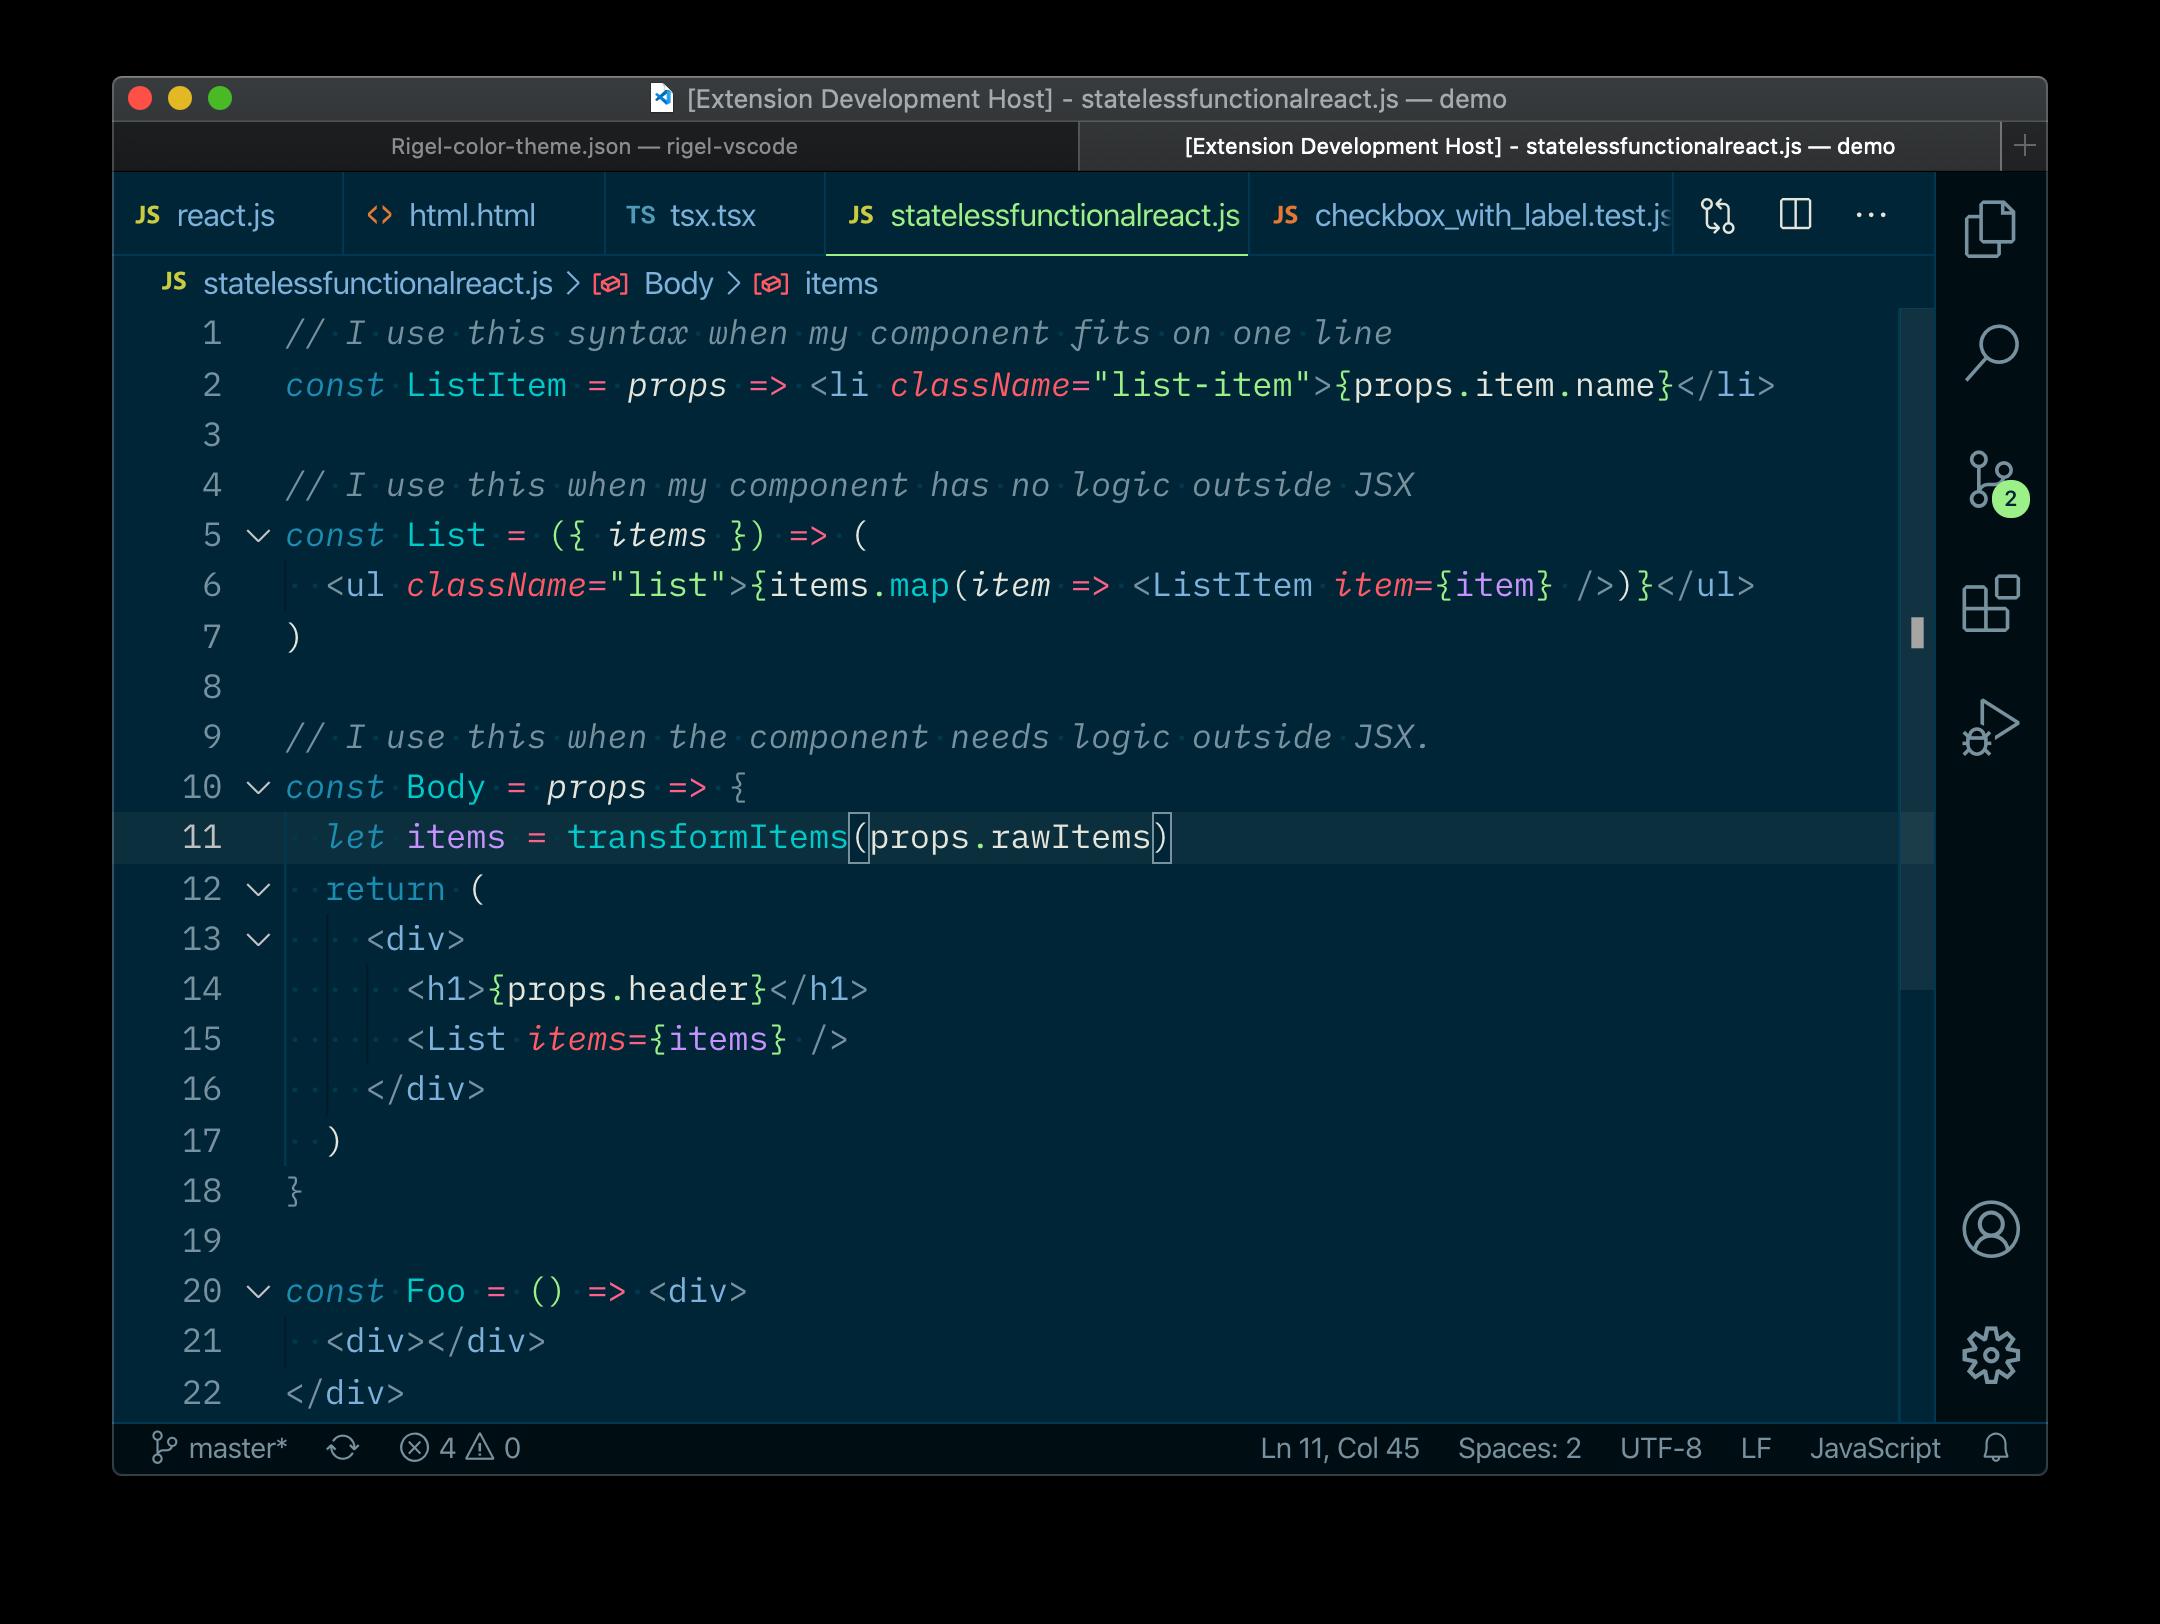 Screenshot of the Rigel VS Code theme